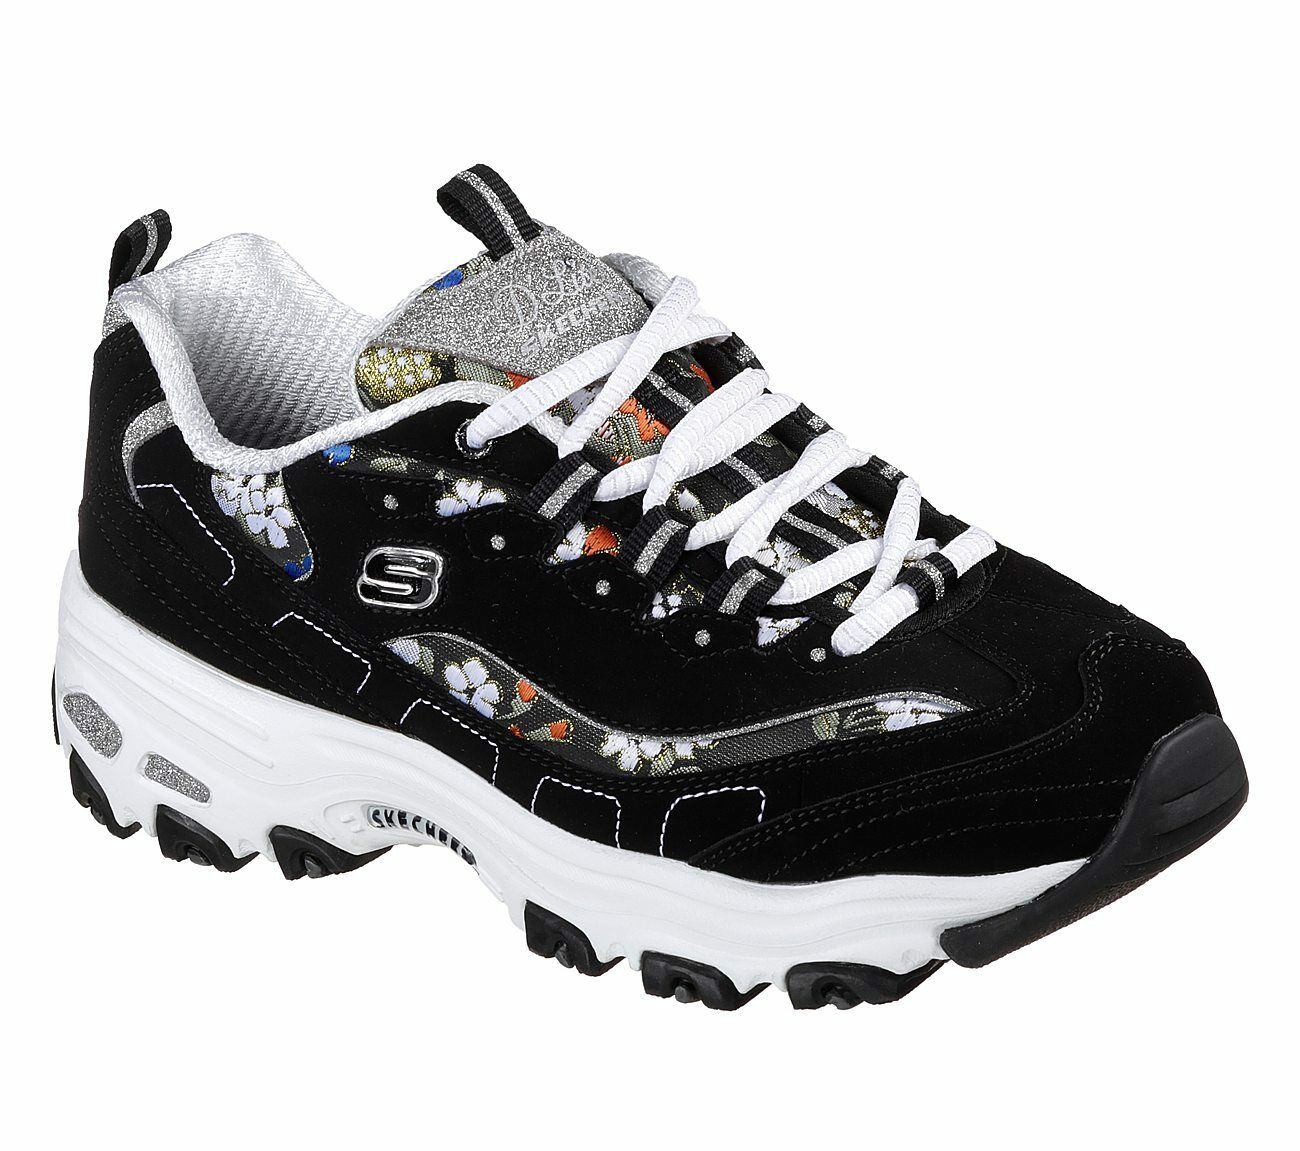 NEU NEU NEU SKECHERS Damen Sneakers D'LITES-FLORAL DAYS Schwarz 7fcc90